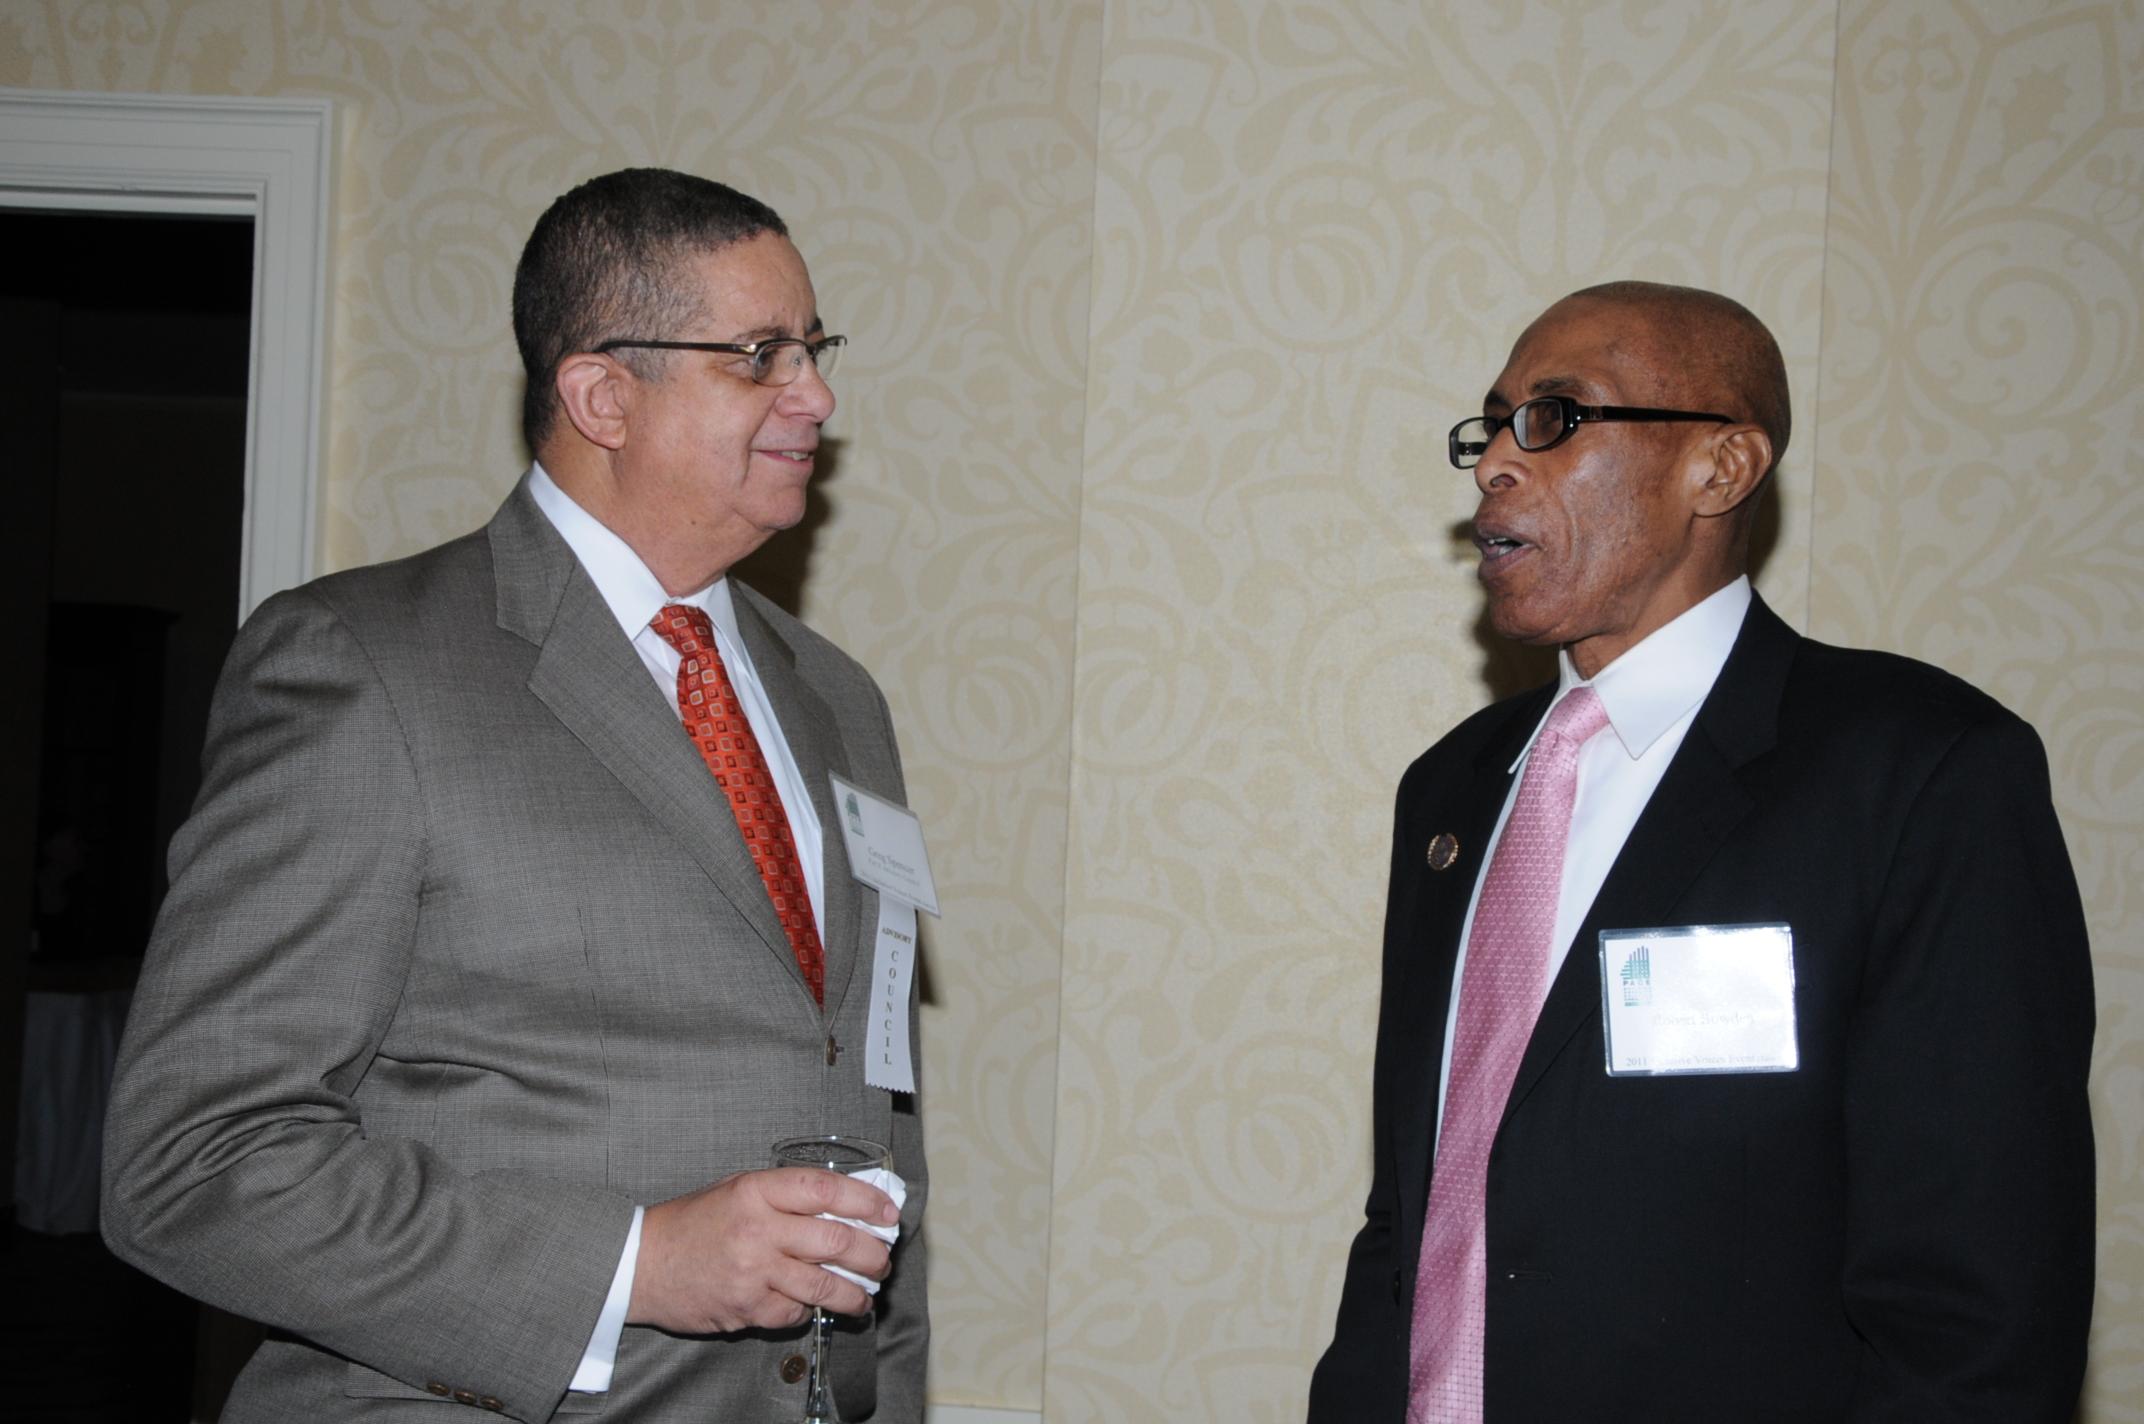 Greg Spencer & Robert Bowden 3.JPG